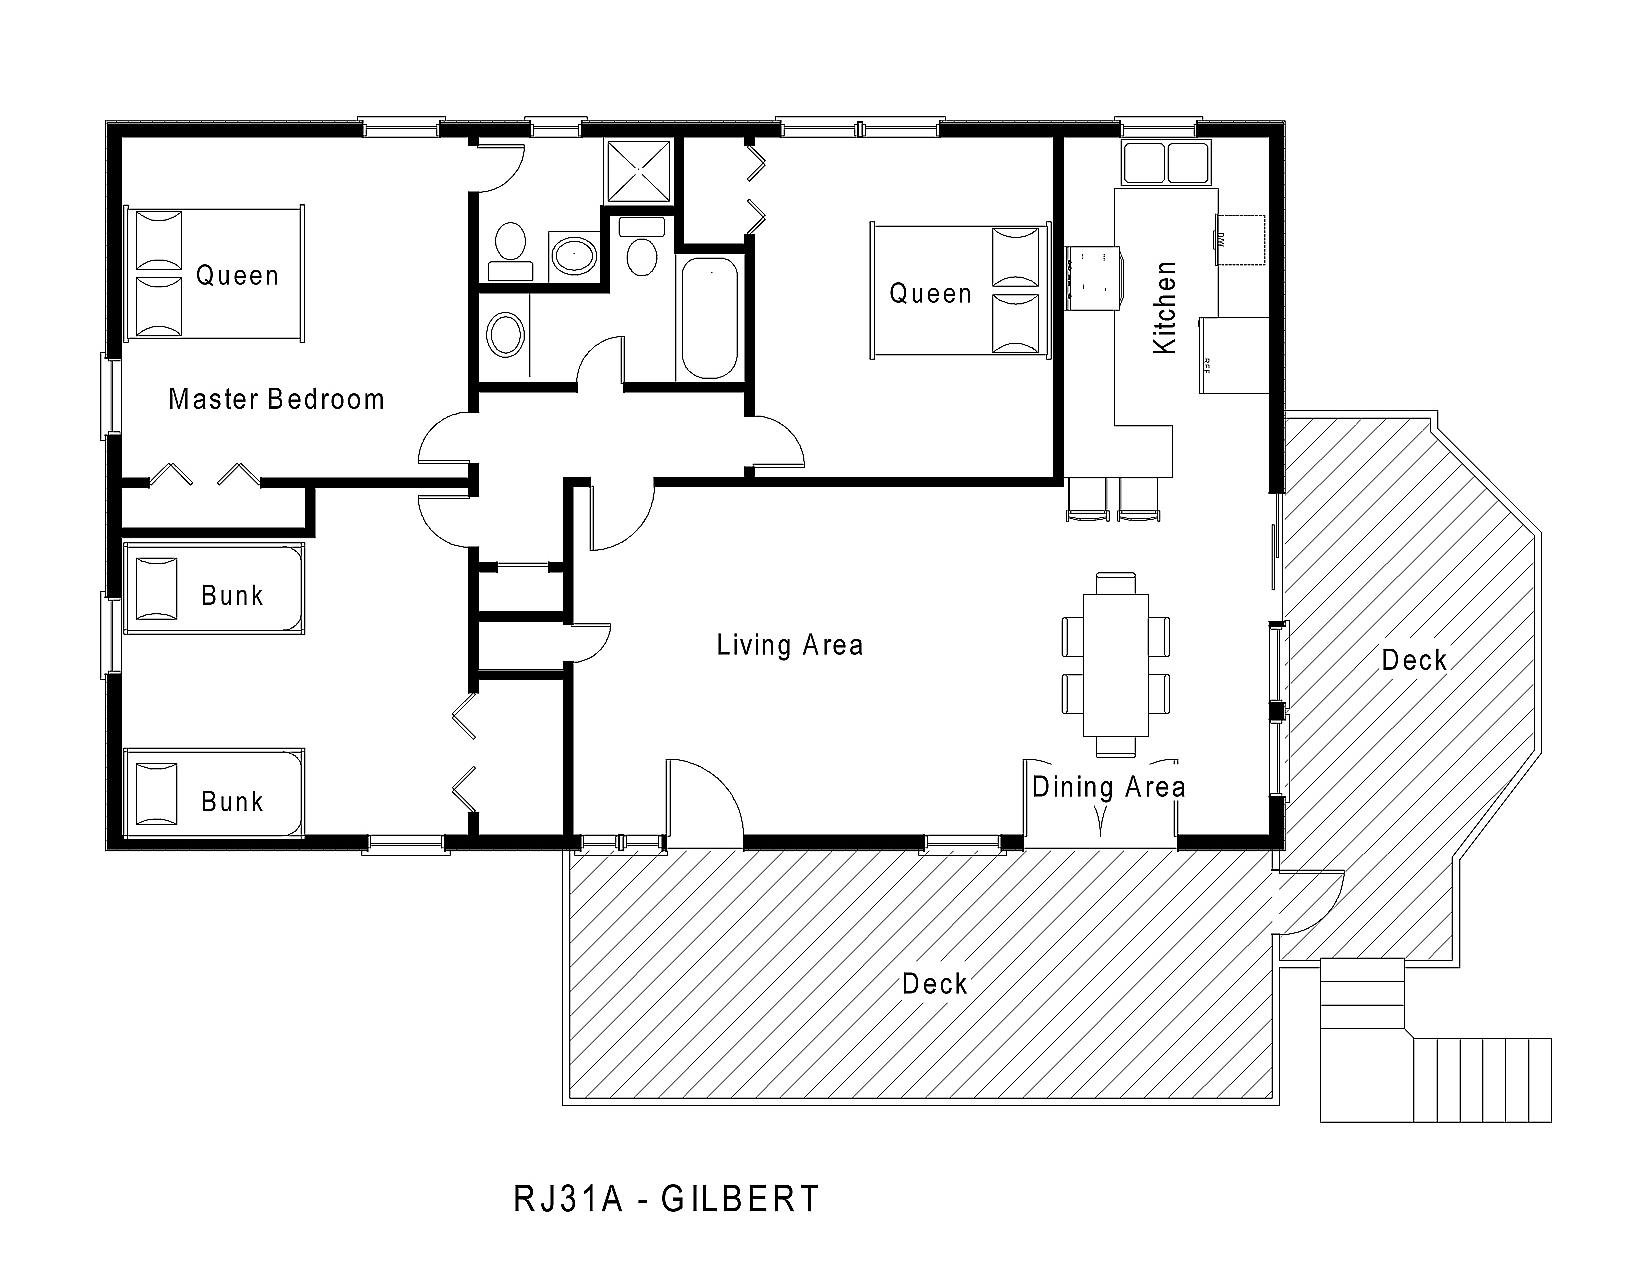 rj31a gilbert floorplan level 1jpg